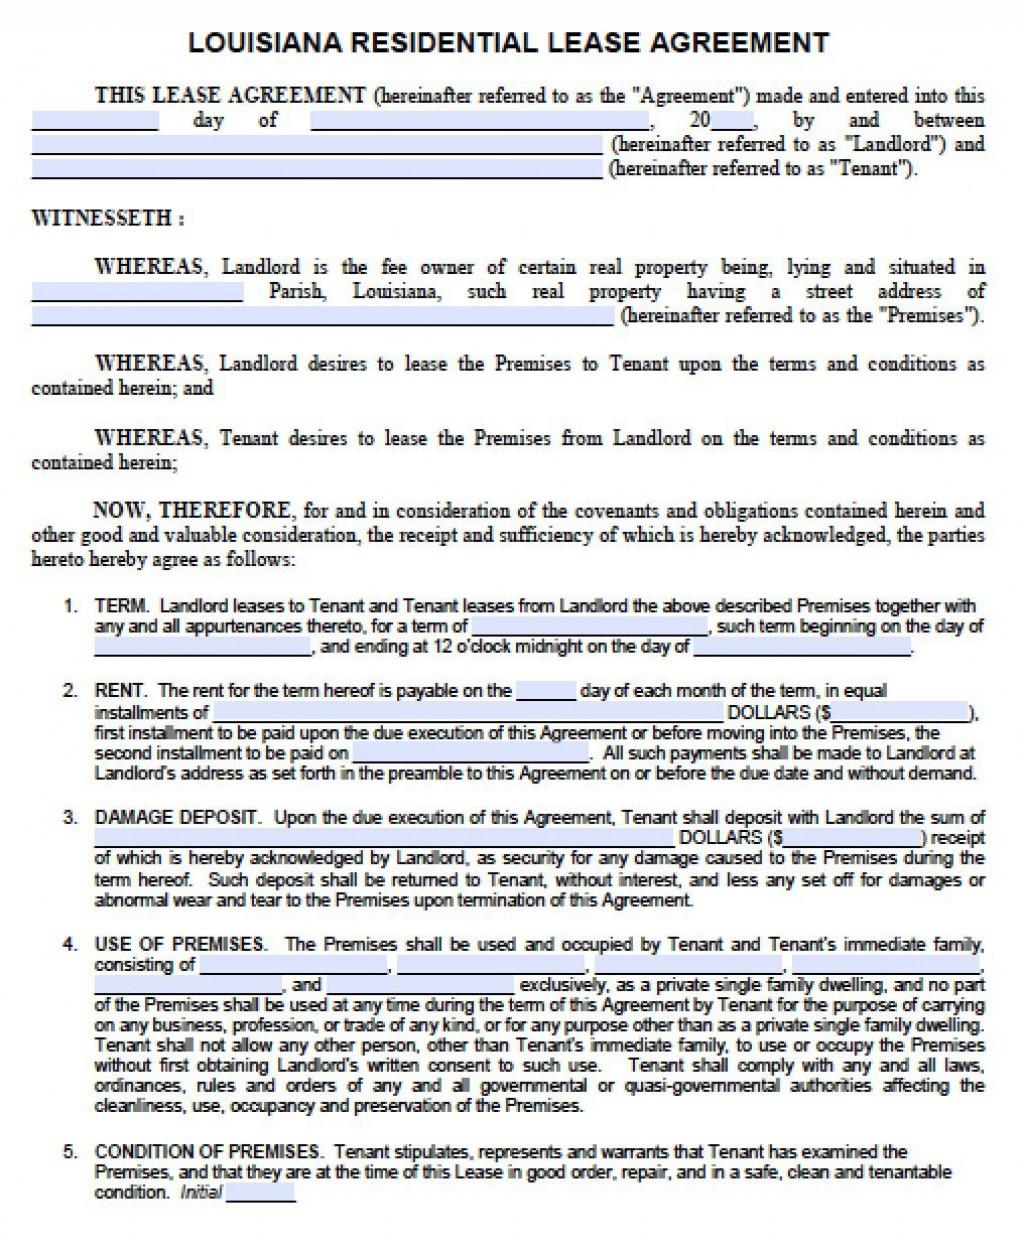 006 Unbelievable Rental Lease Template Free High Resolution  Agreement Sample Download Residential PrintableLarge